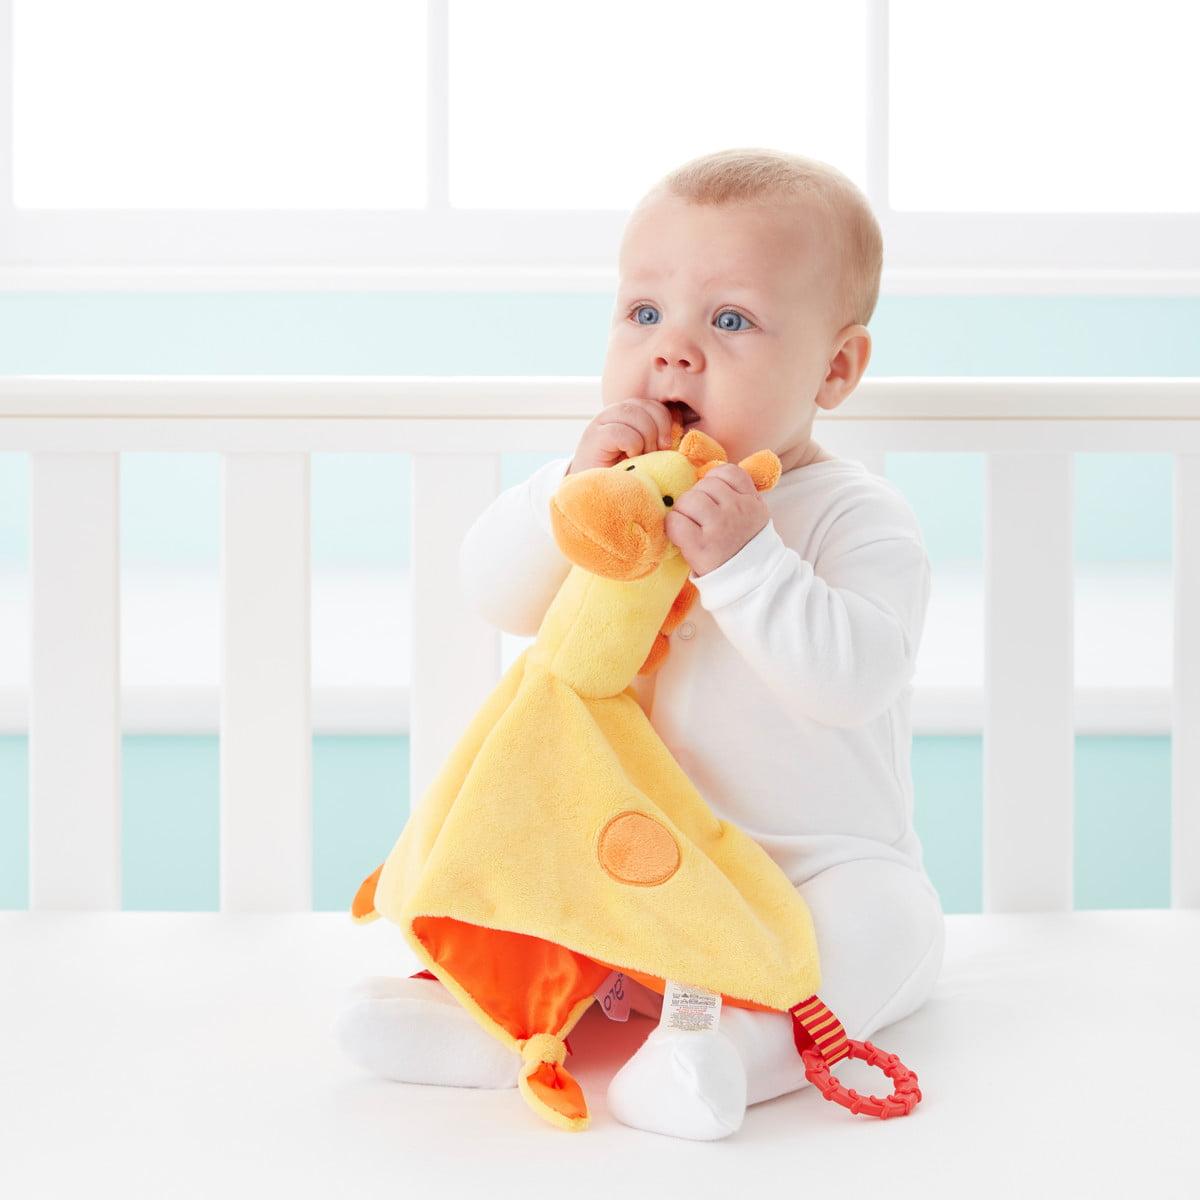 NEW Tommee Tippee Soft Comforter Giraffe Calm Play Toy Puppet Newborn Baby Gift